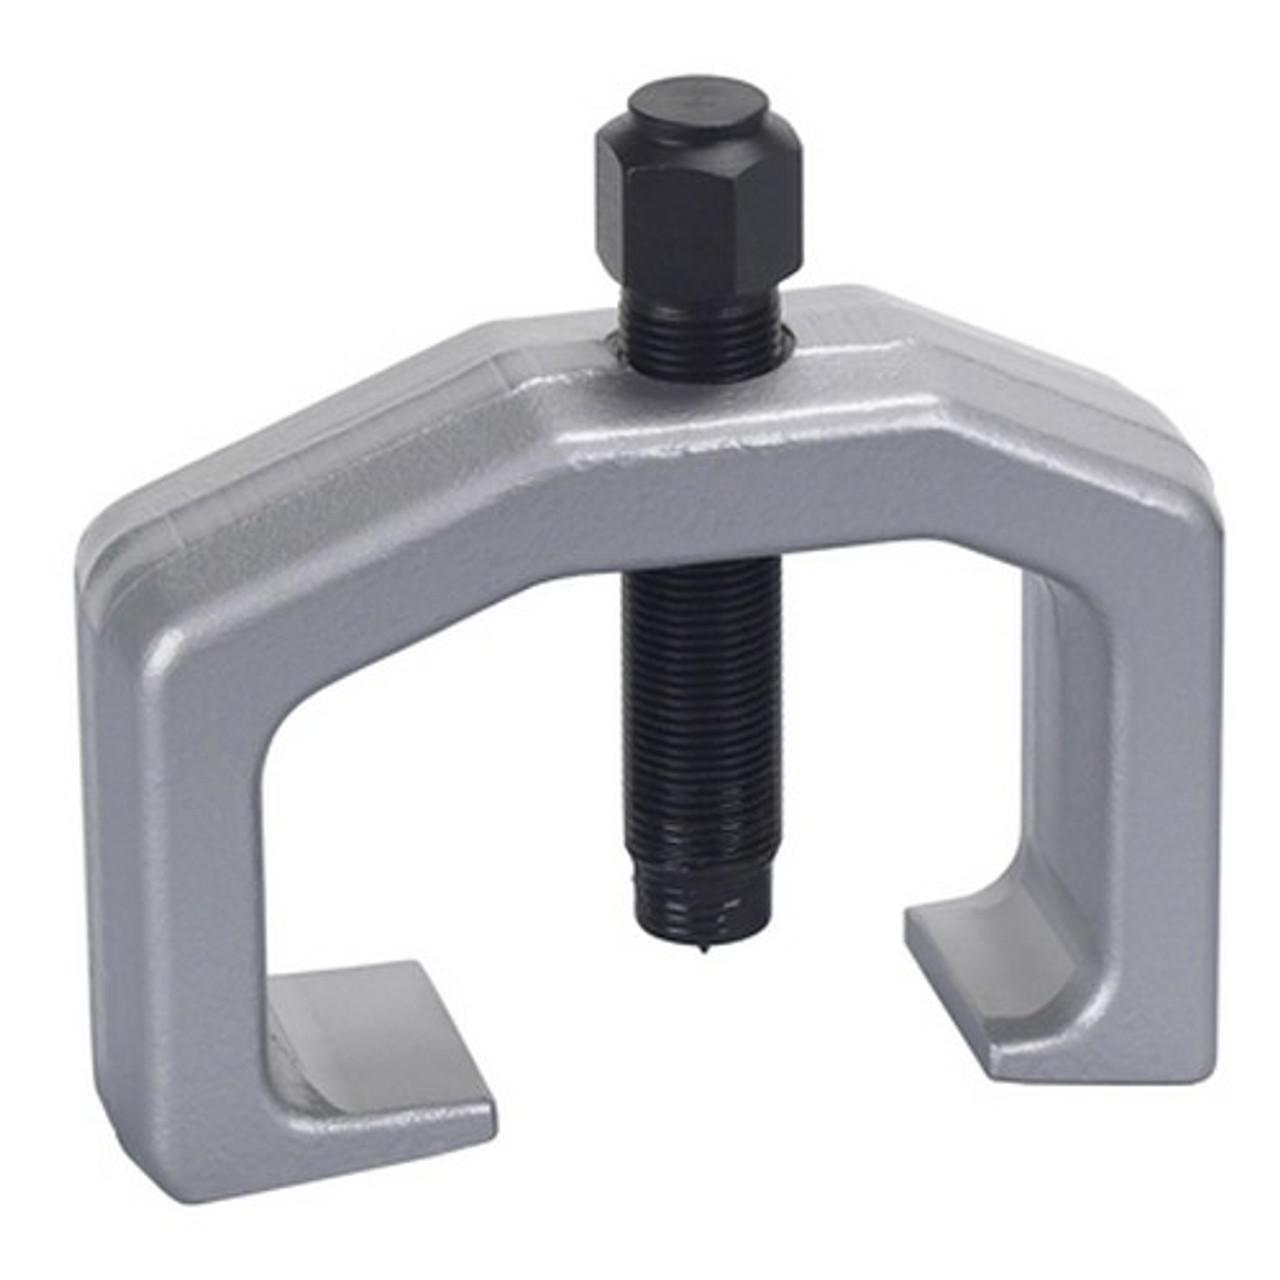 OTC 5056 Automatic Slack Adjuster Puller for Trucks & Trailers